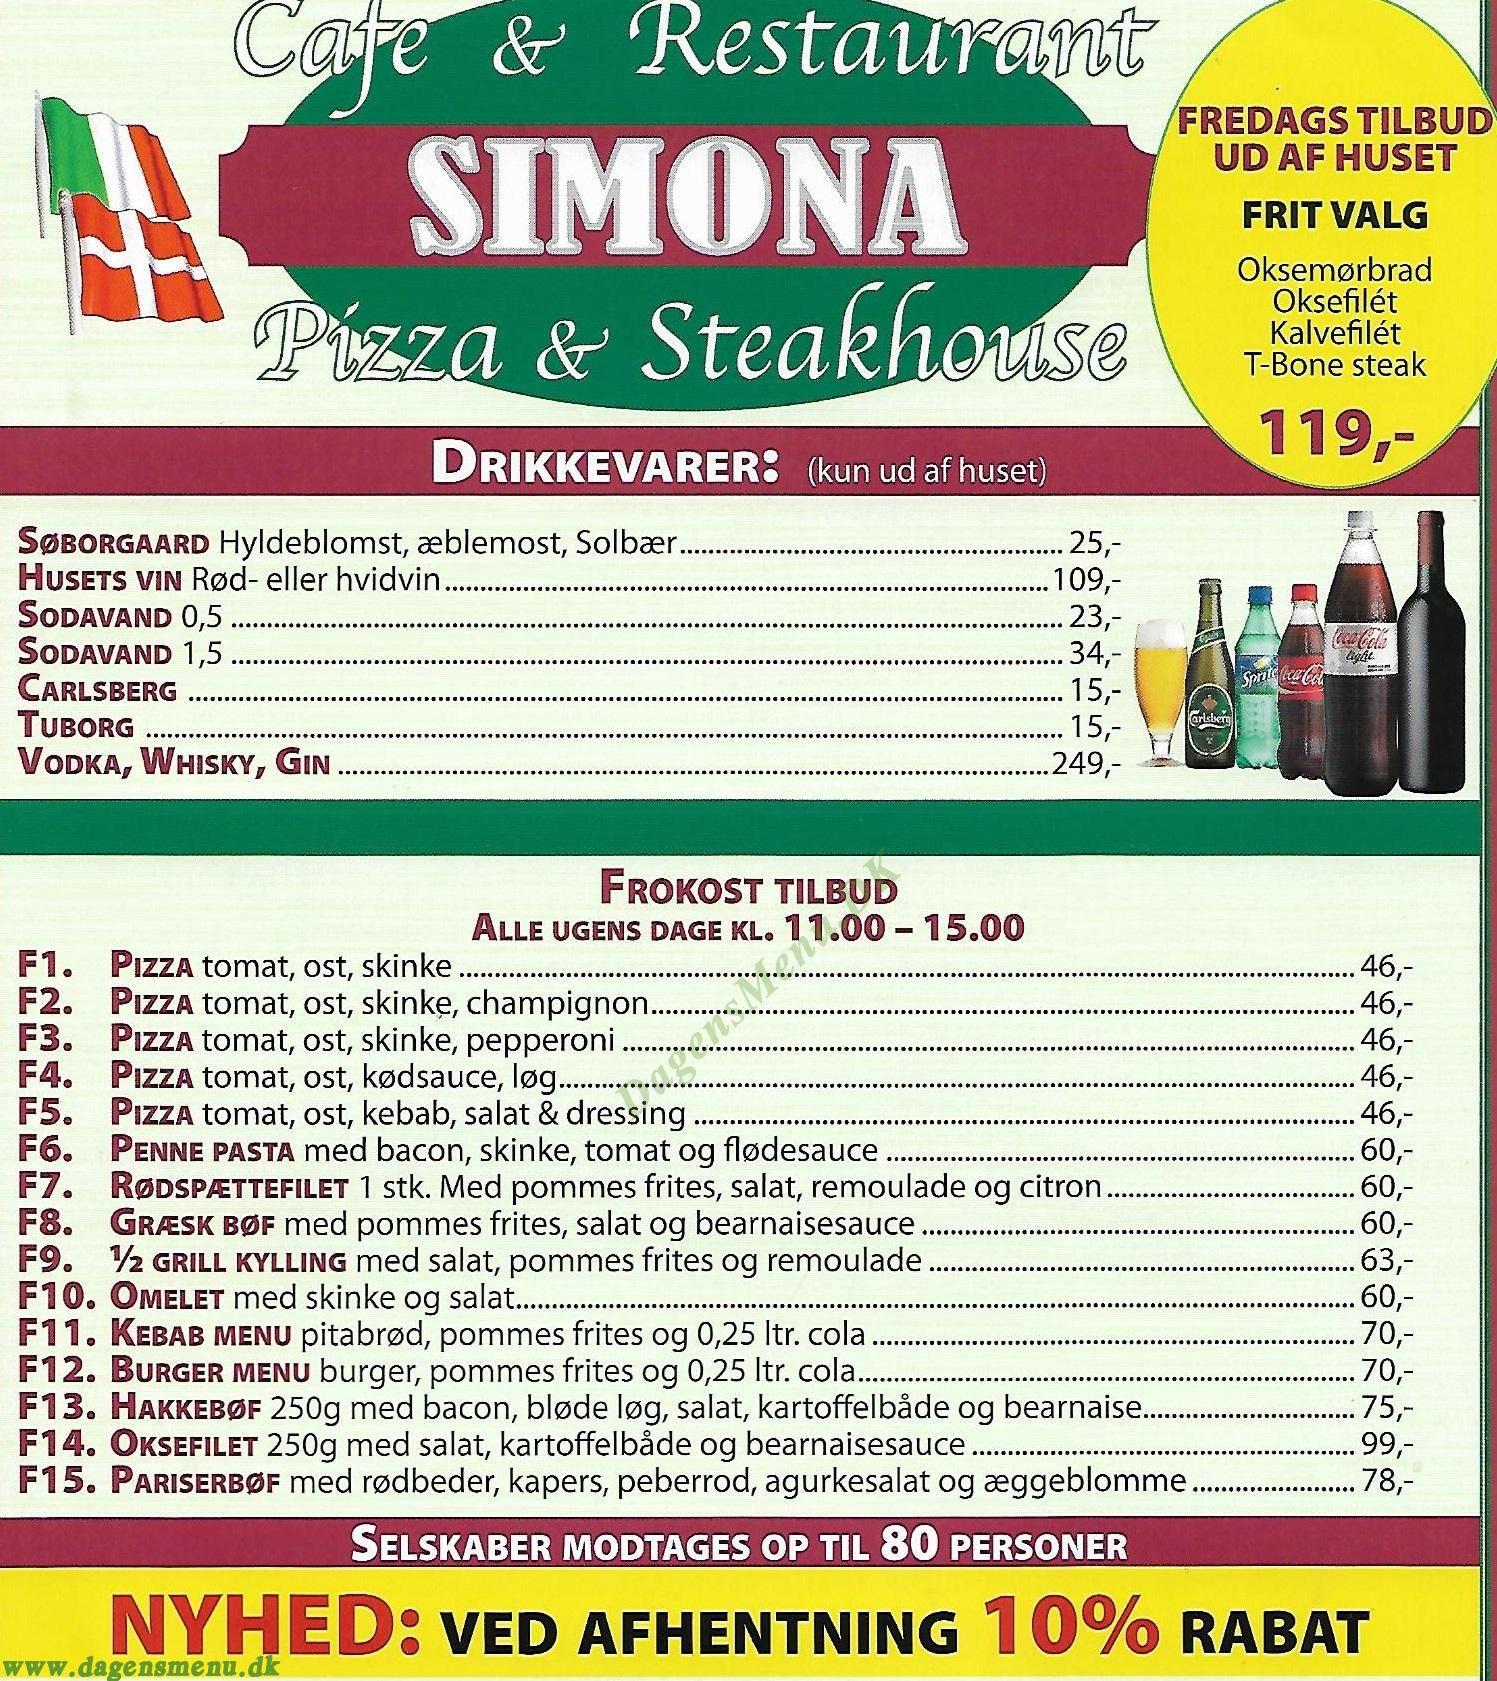 Simona Pizzeria & Restaurant - Menukort